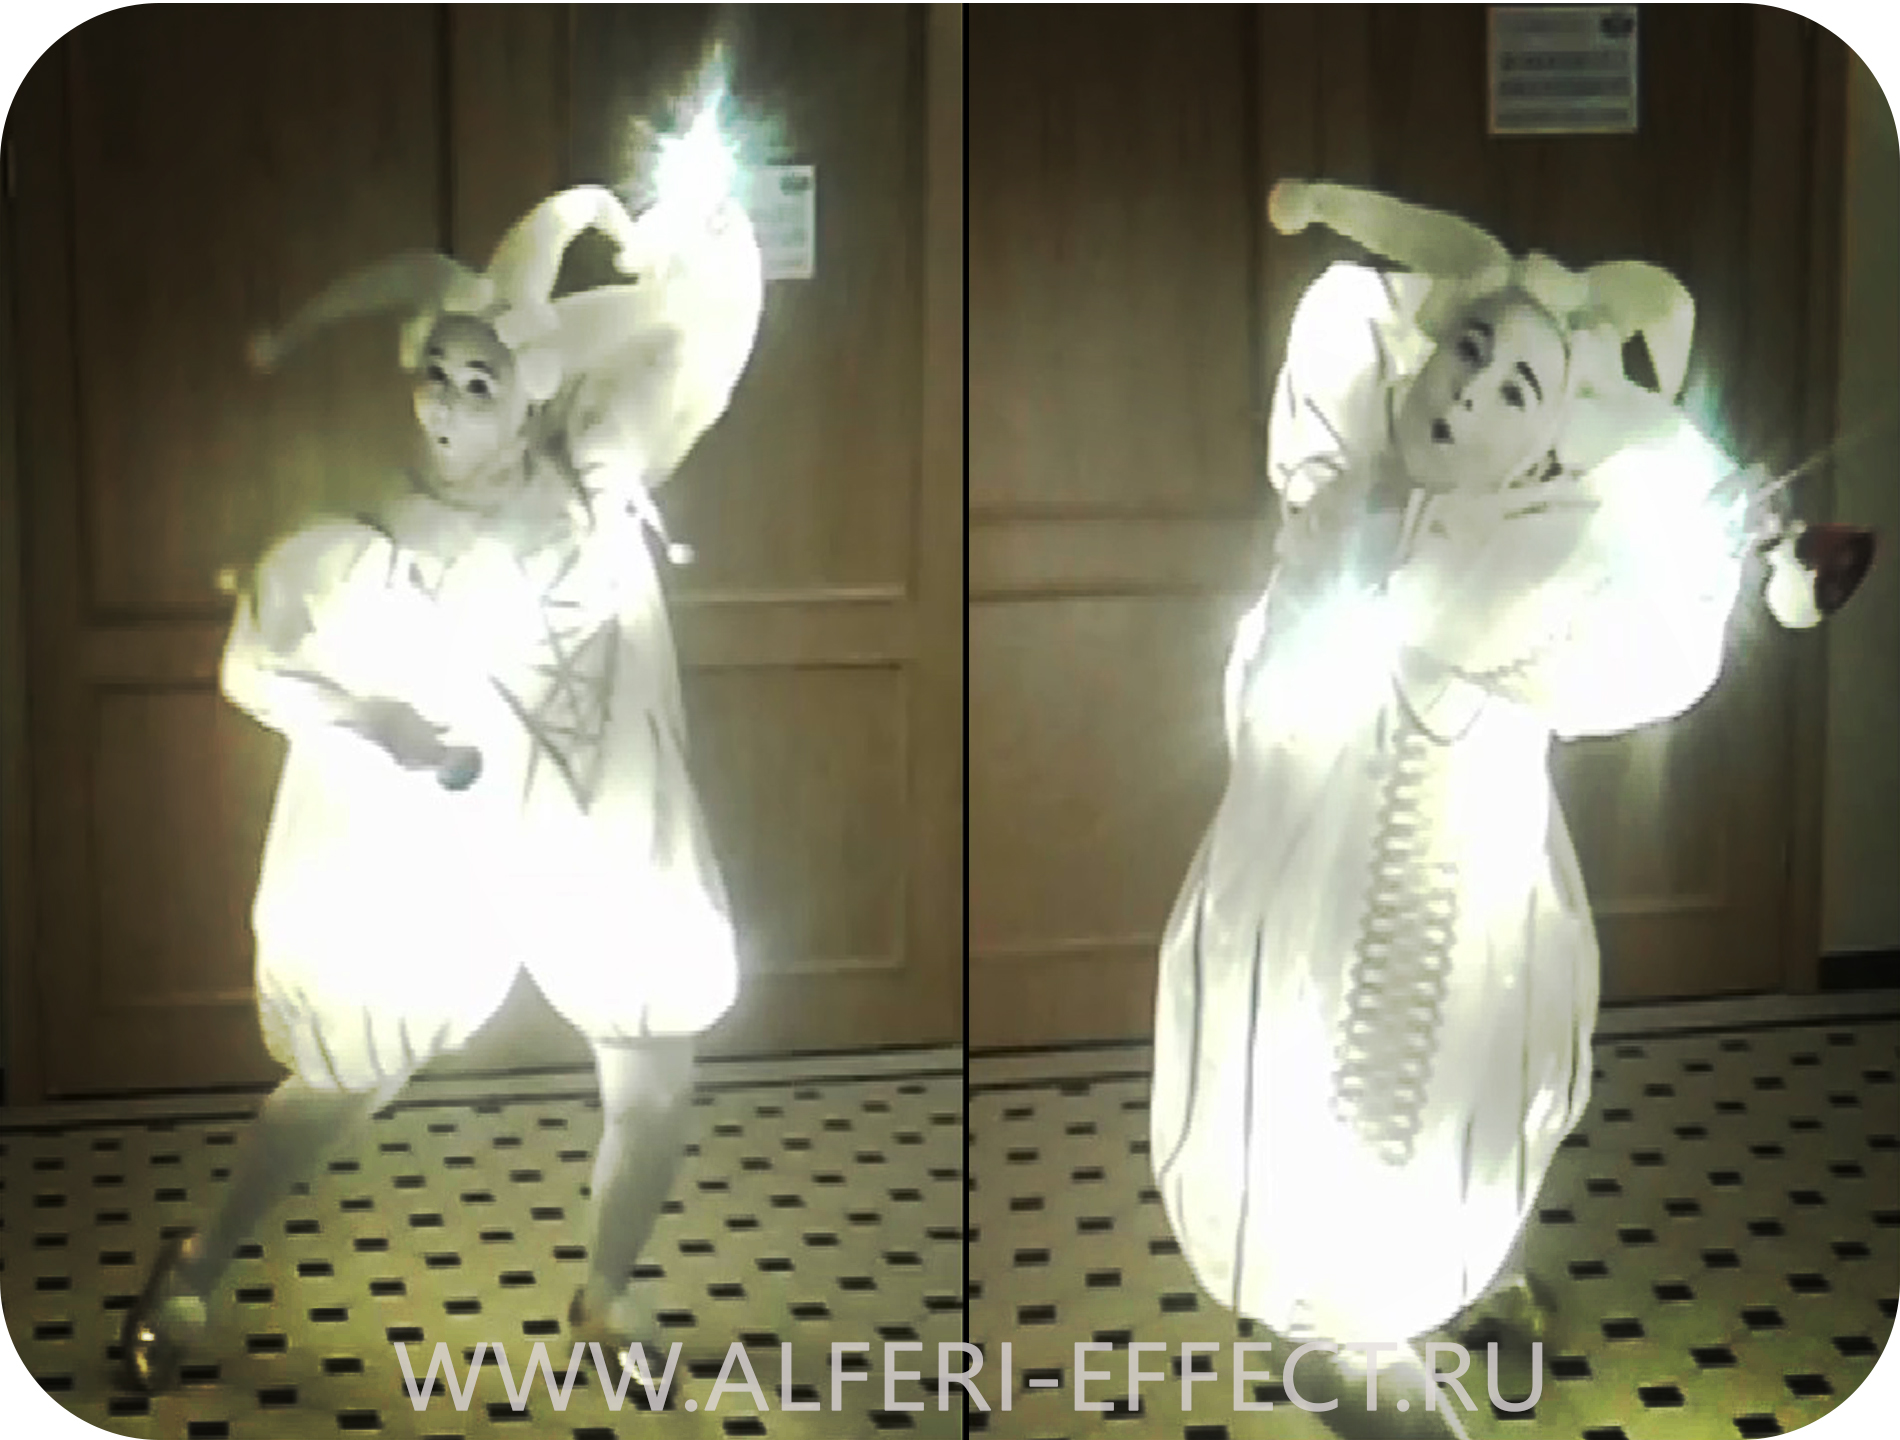 Подсветка костюма клоуна - для шоу Олега Попова